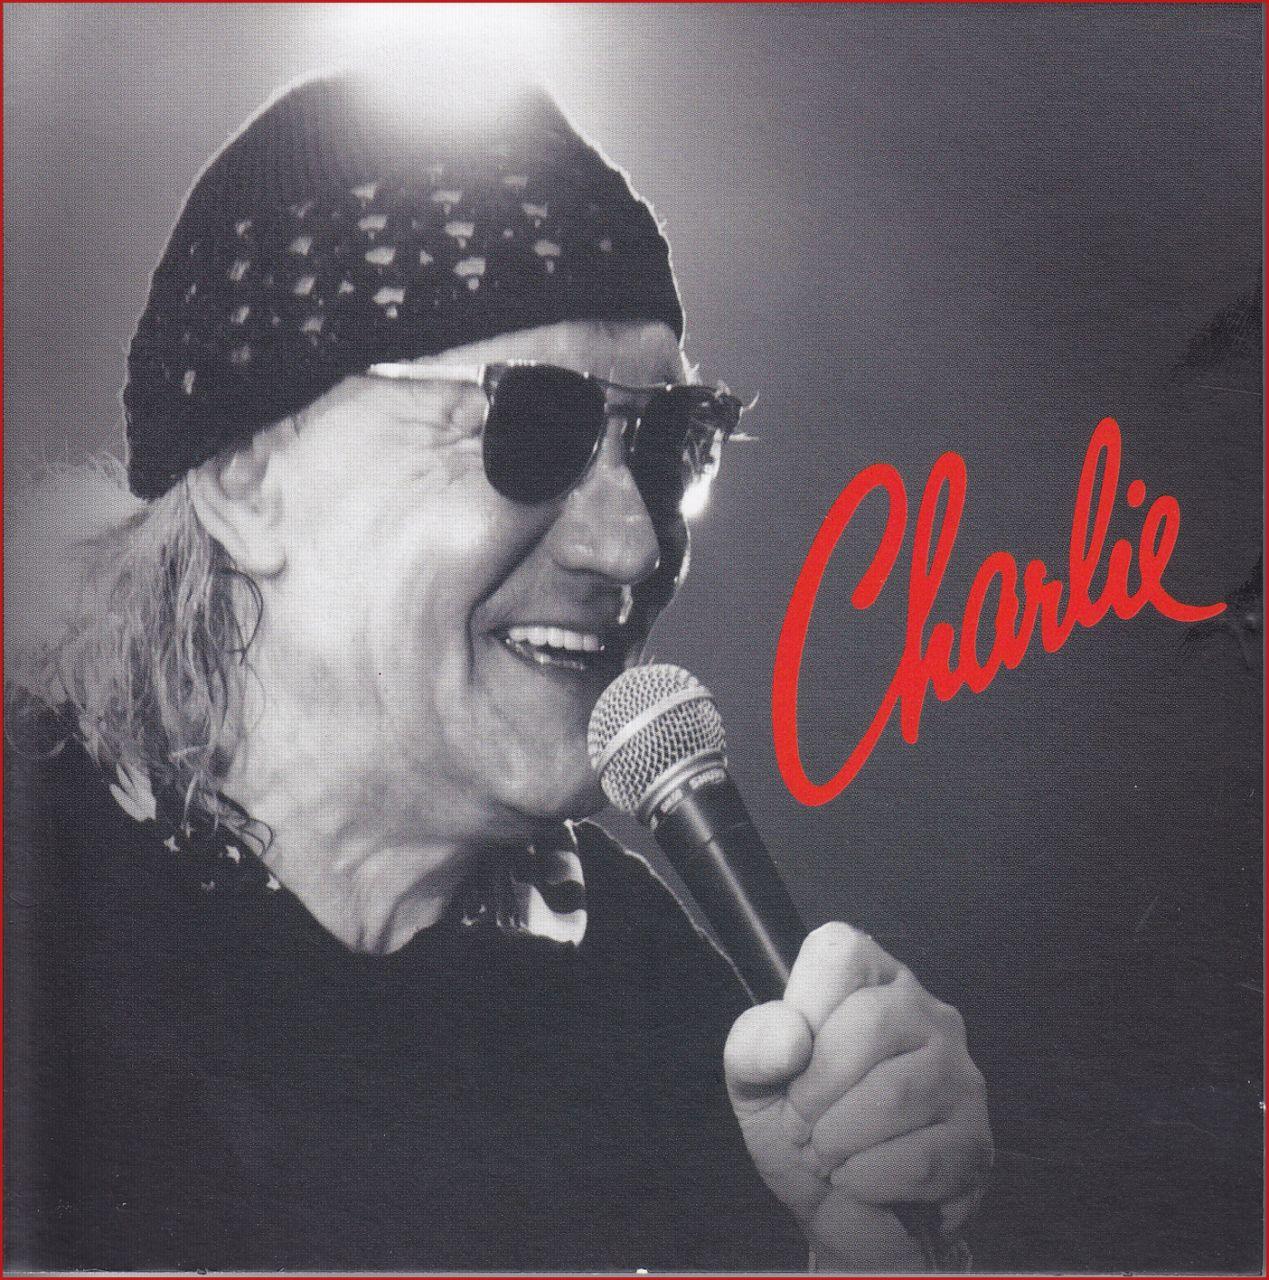 Charlie: Mindenen túl (CD)